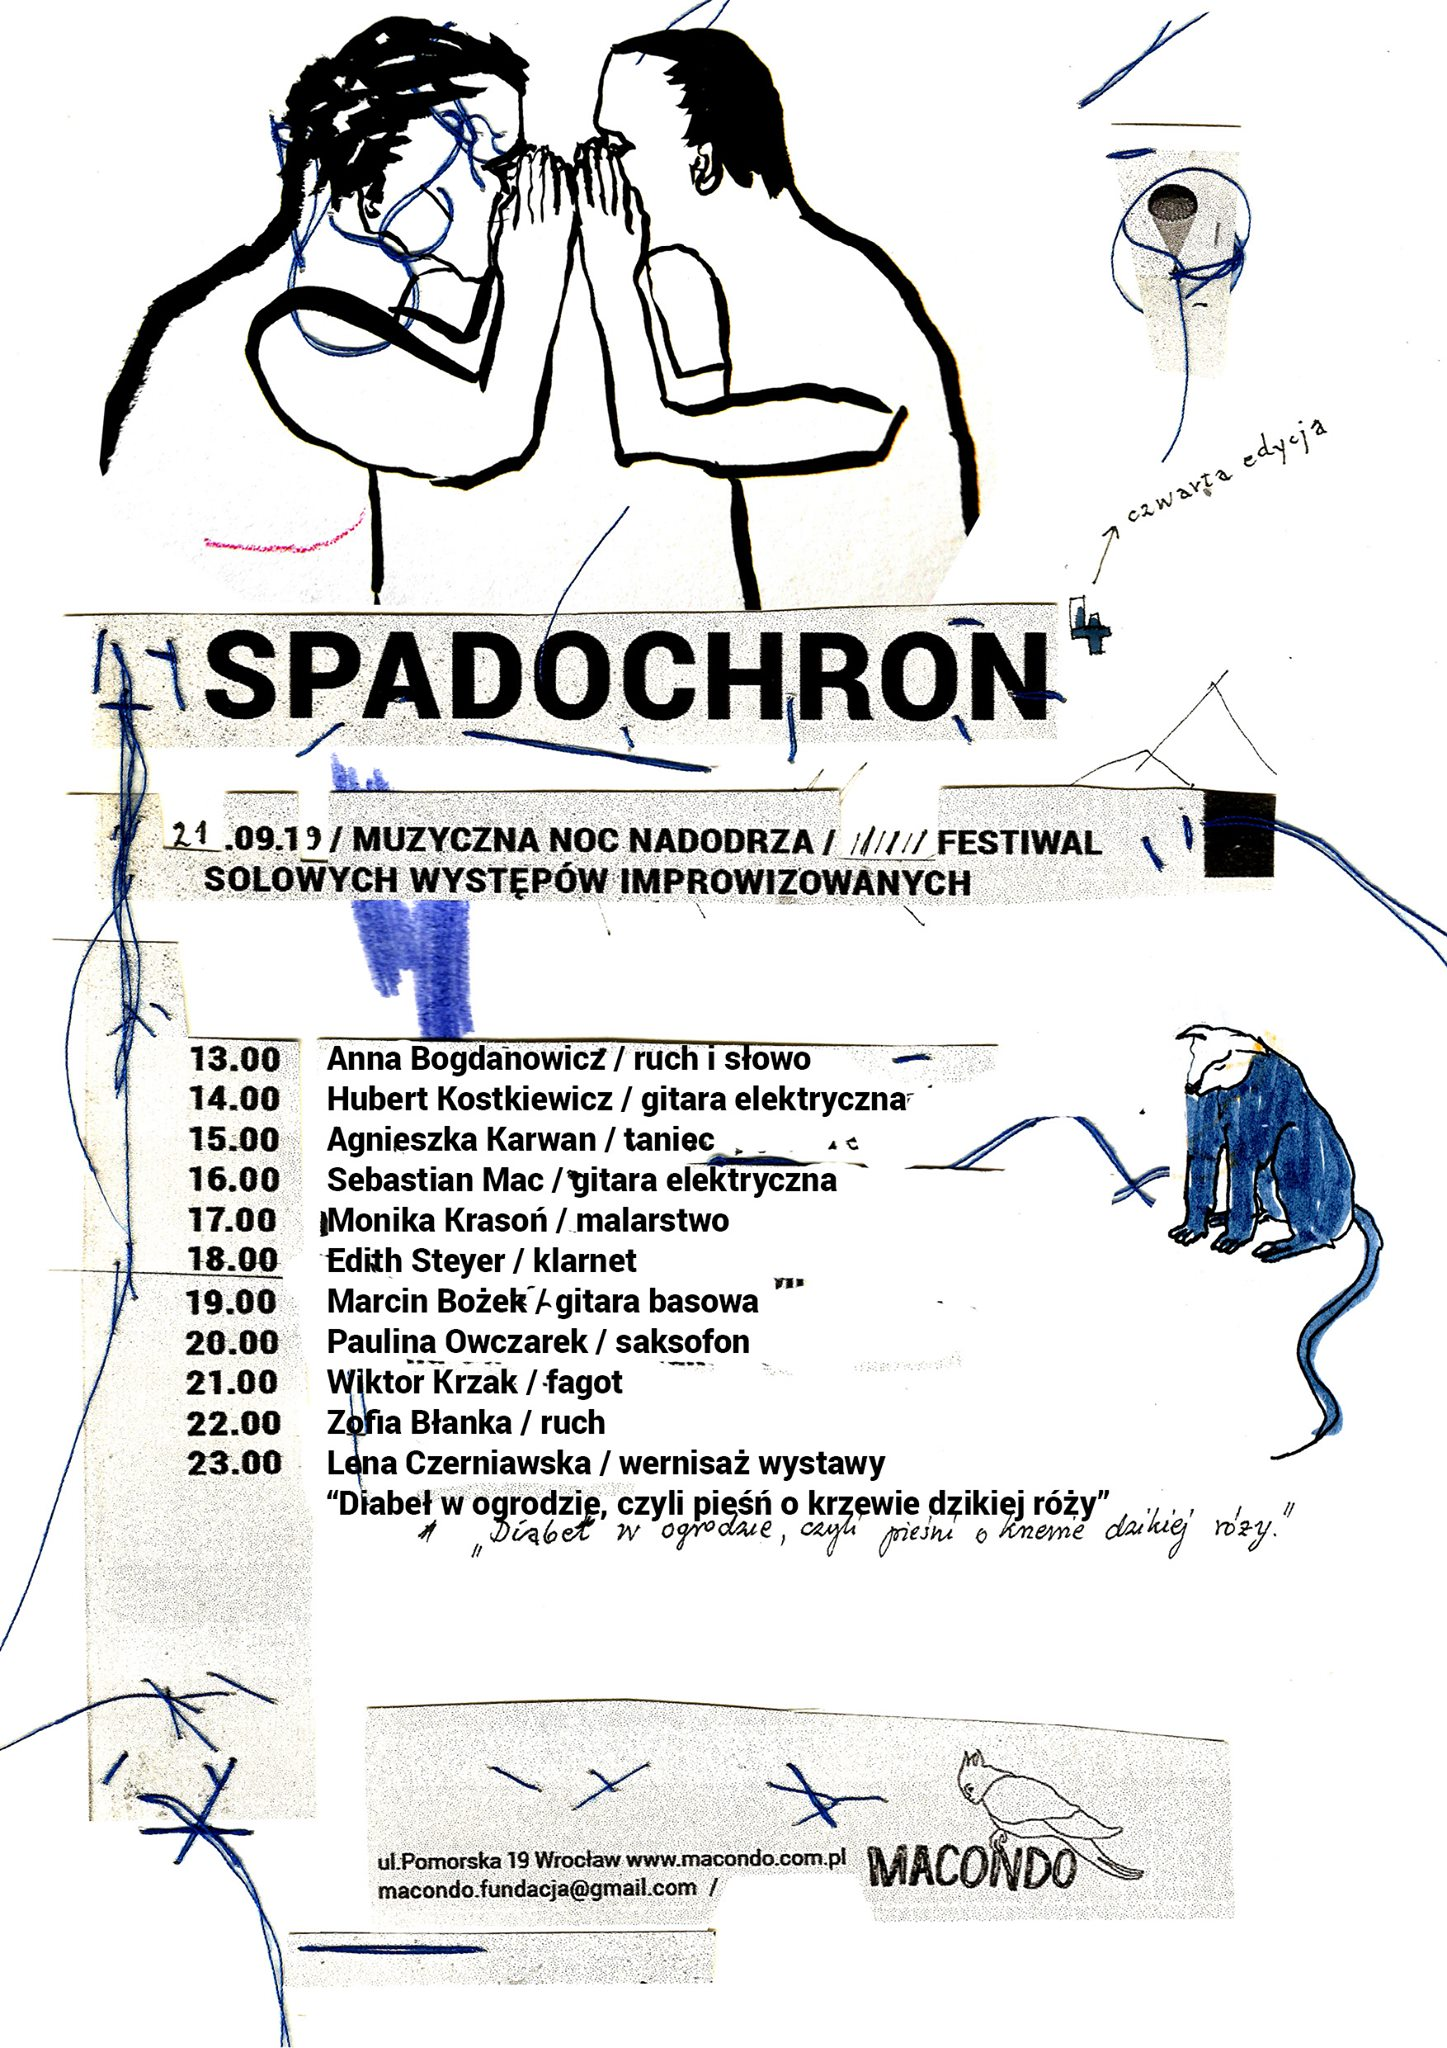 spadochron 2019